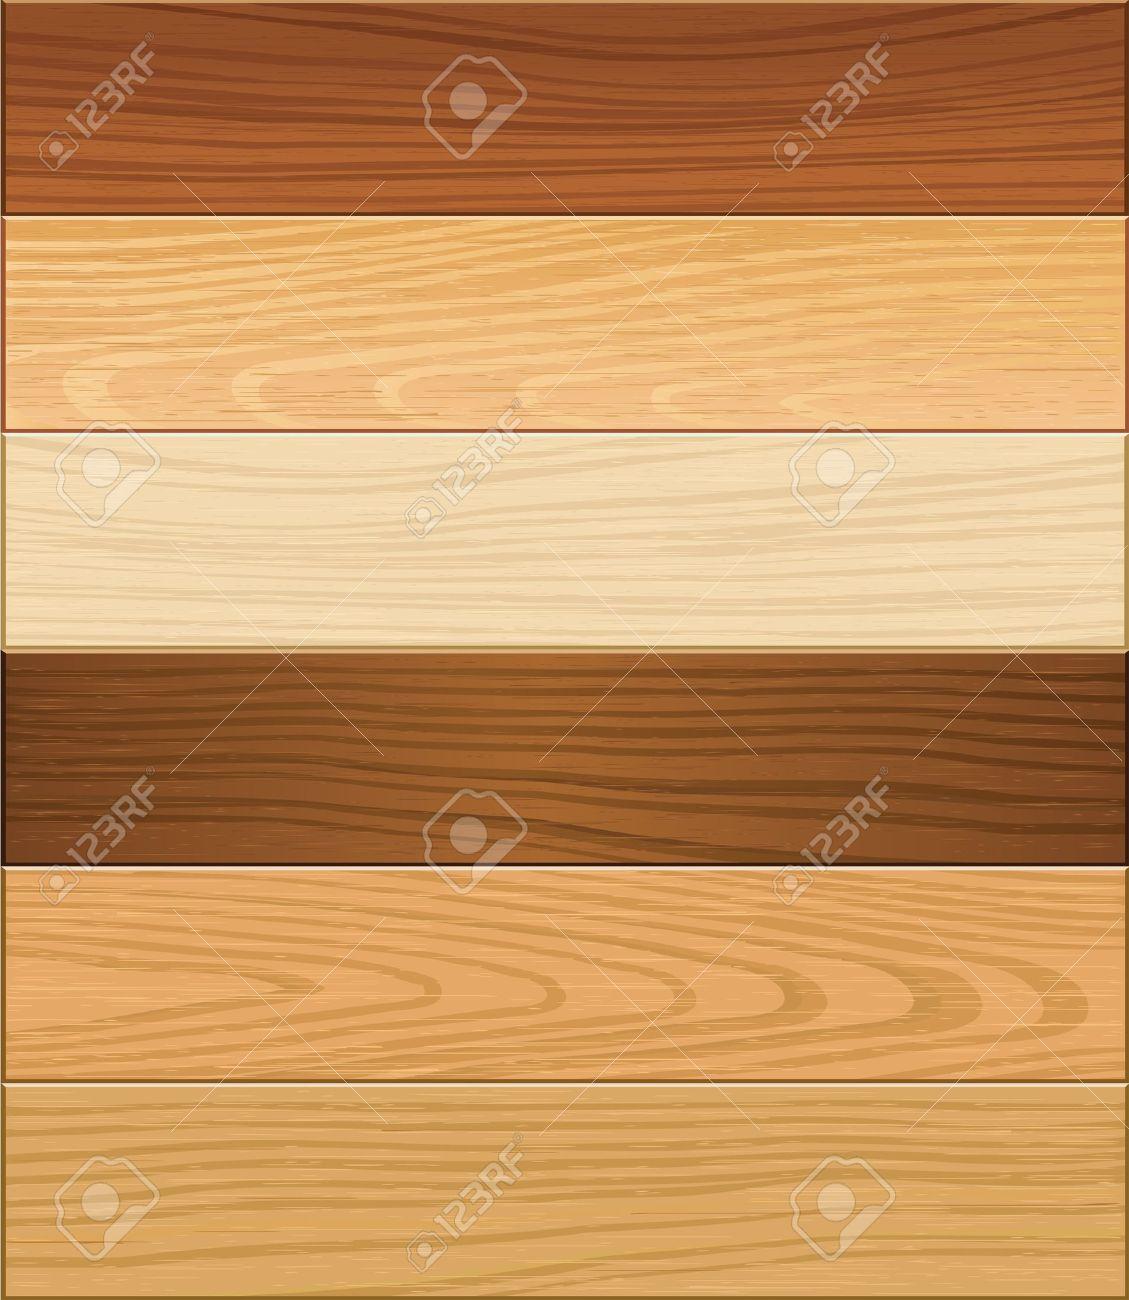 Wooden parquet vector illustrator - 12801577